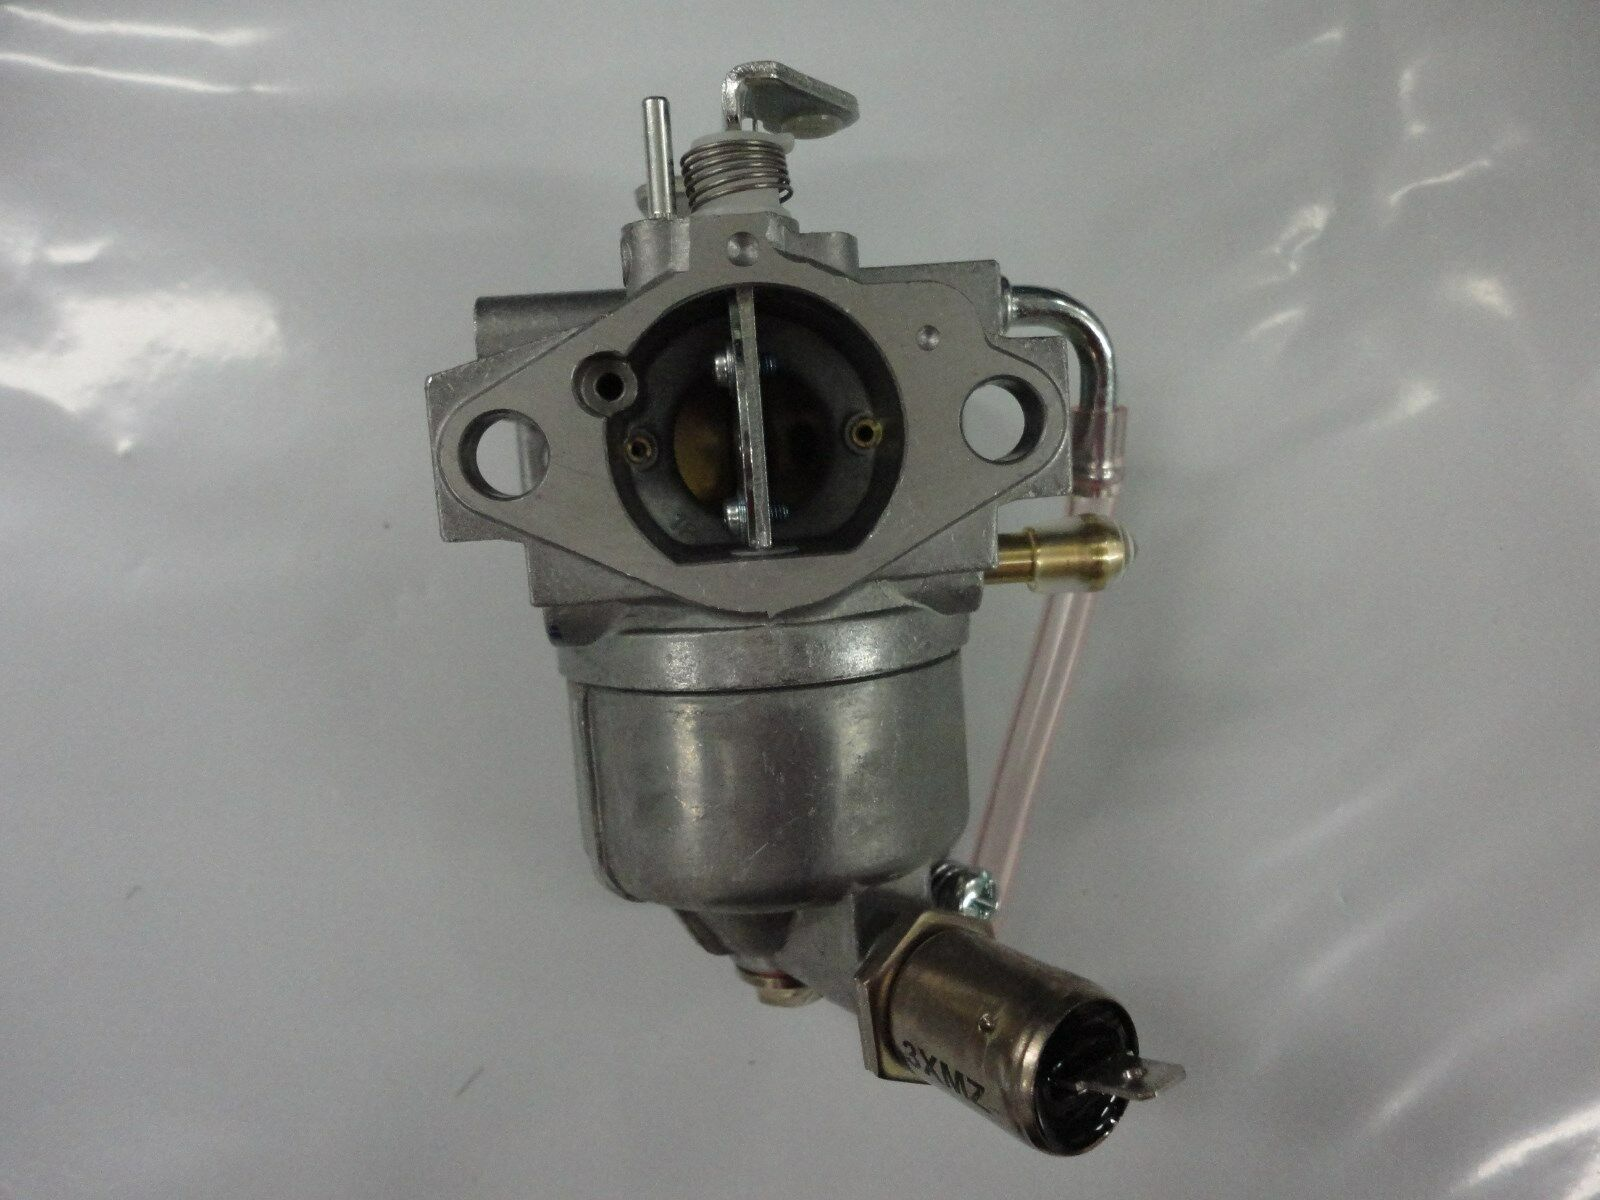 JOHN DEERE Genuino Original Equipment Manufacturer Cocheburador AM109205 GT242 LX 172 176 240 170 175